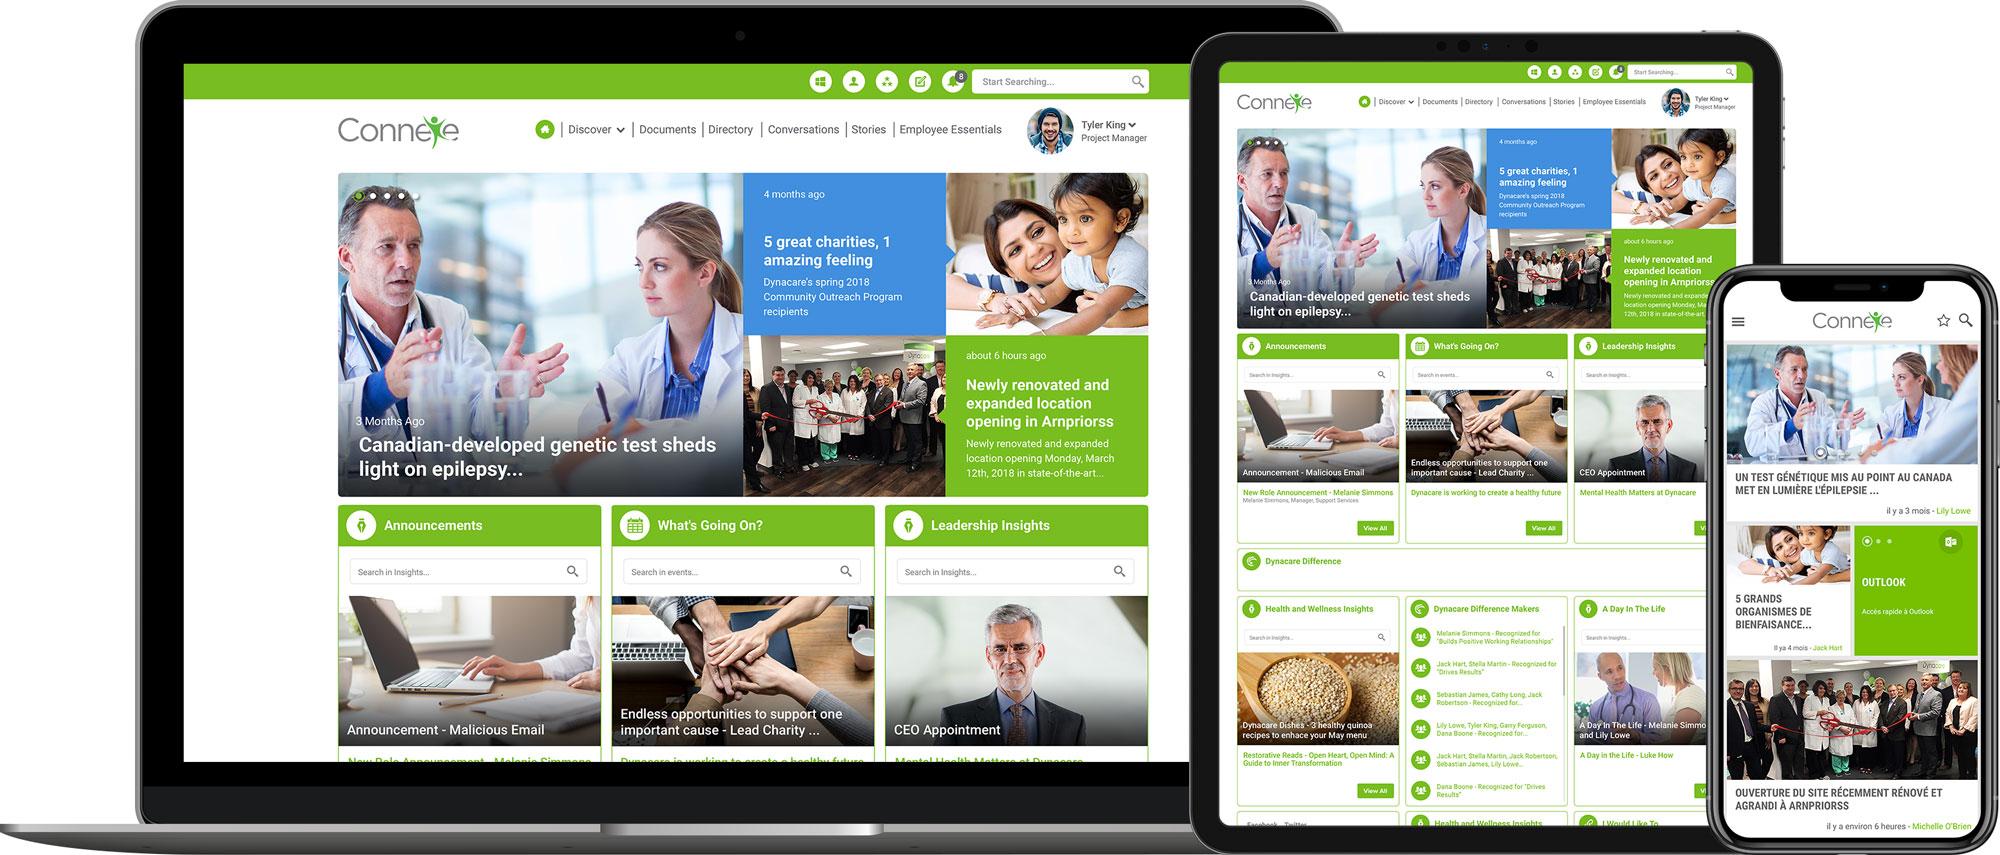 Dynacare's Nielsen Norman Award-winning platform